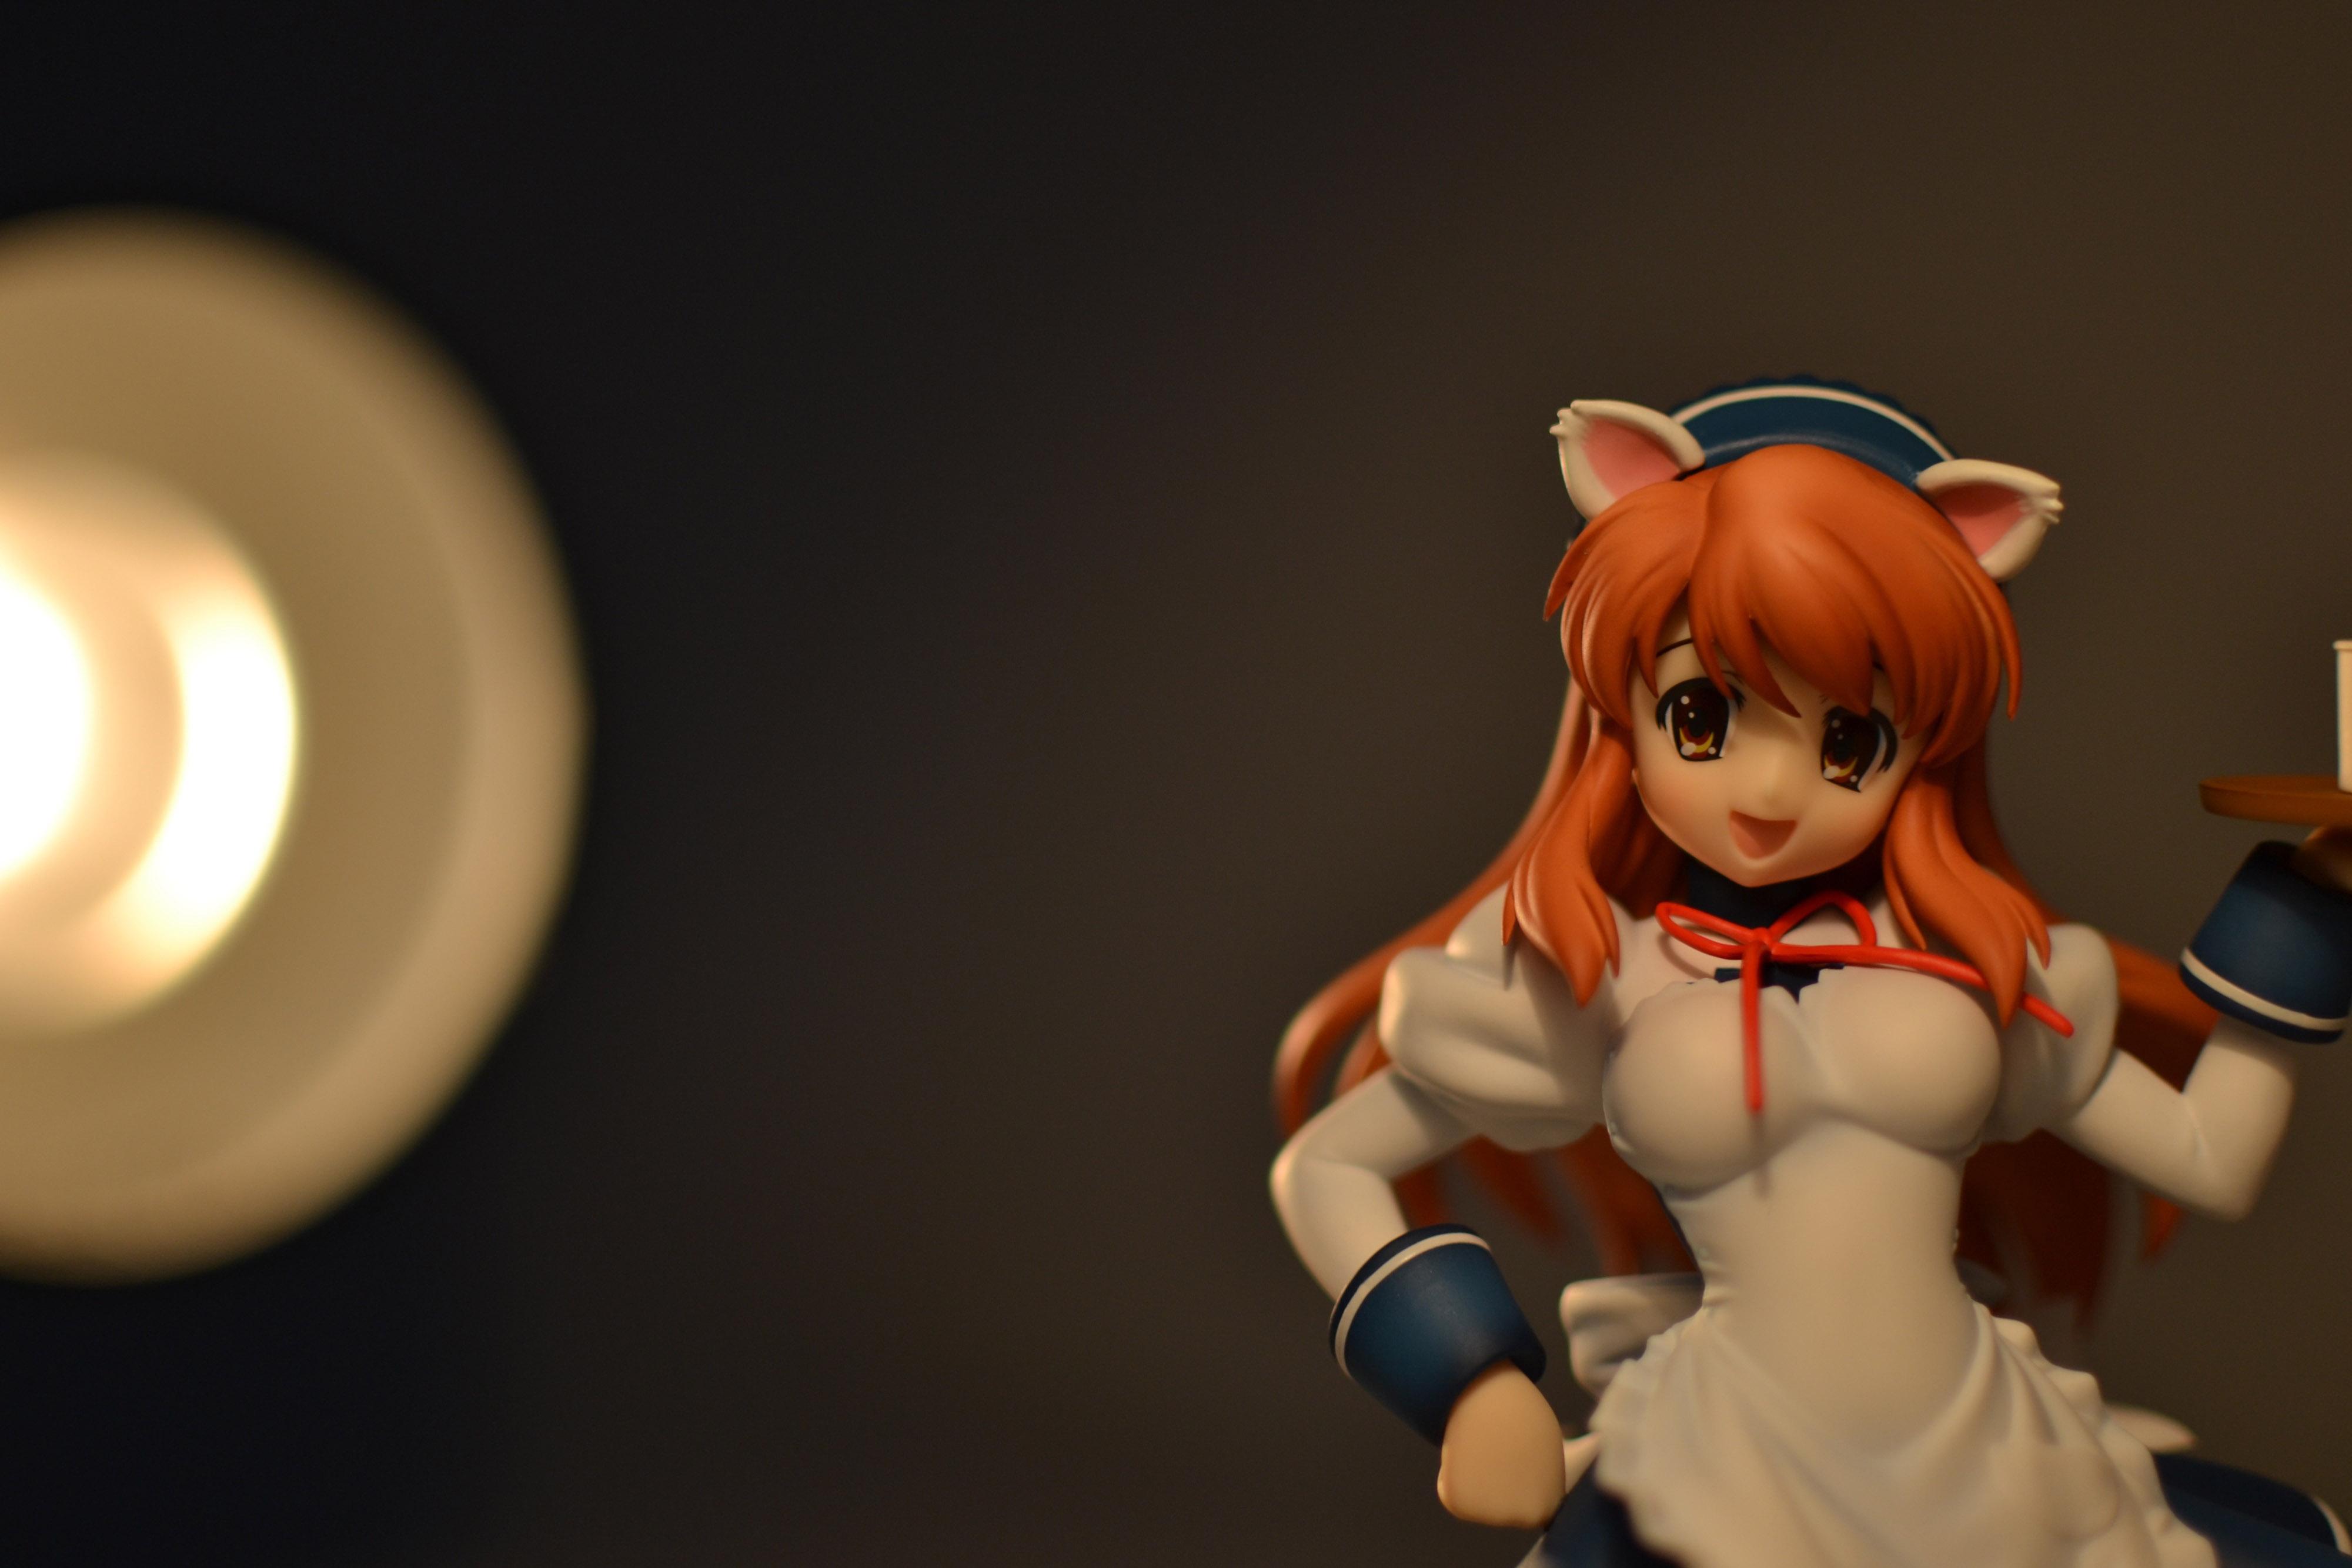 maid cat_ears waitress max_factory asahina_mikuru suzumiya_haruhi_no_yuuutsu chieri